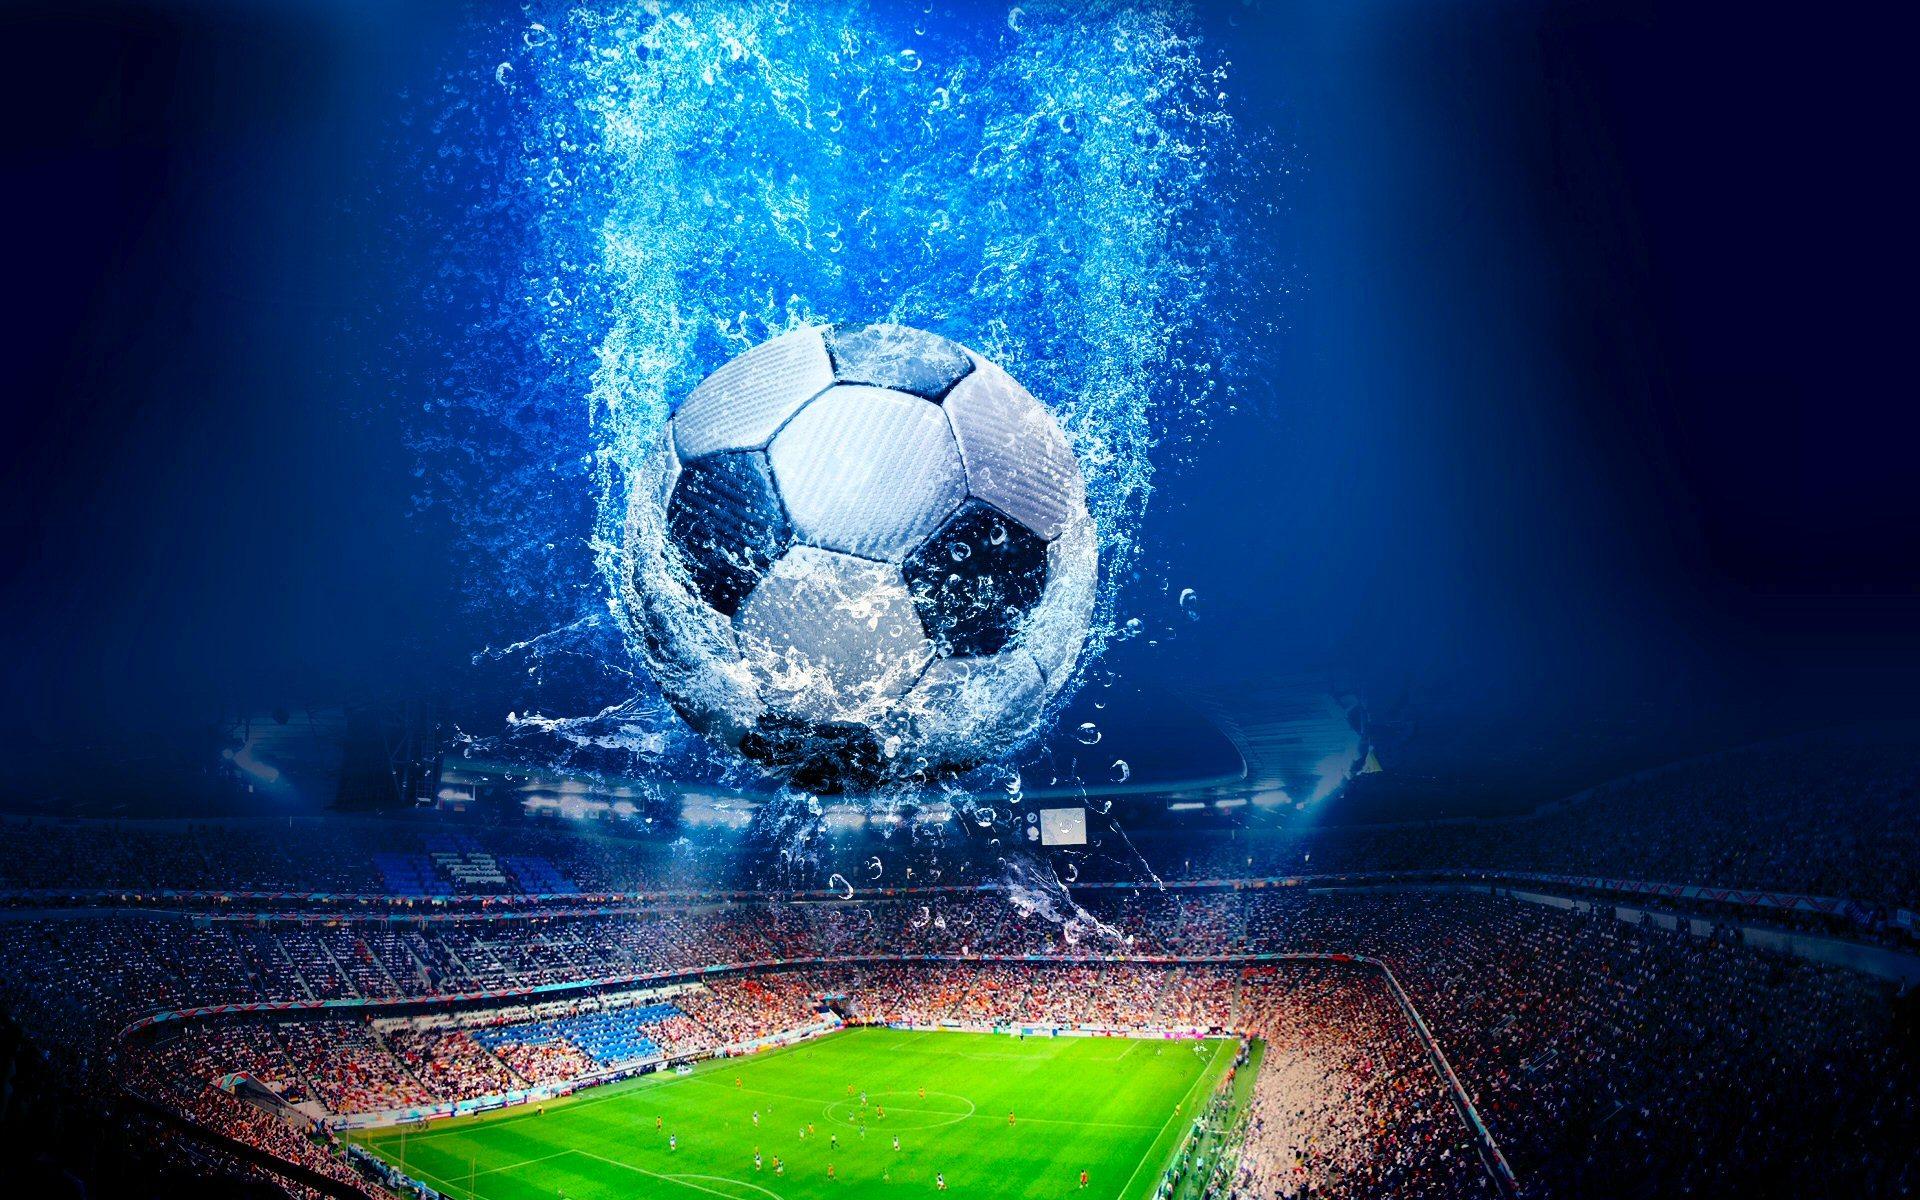 Красивые картинки про футбол